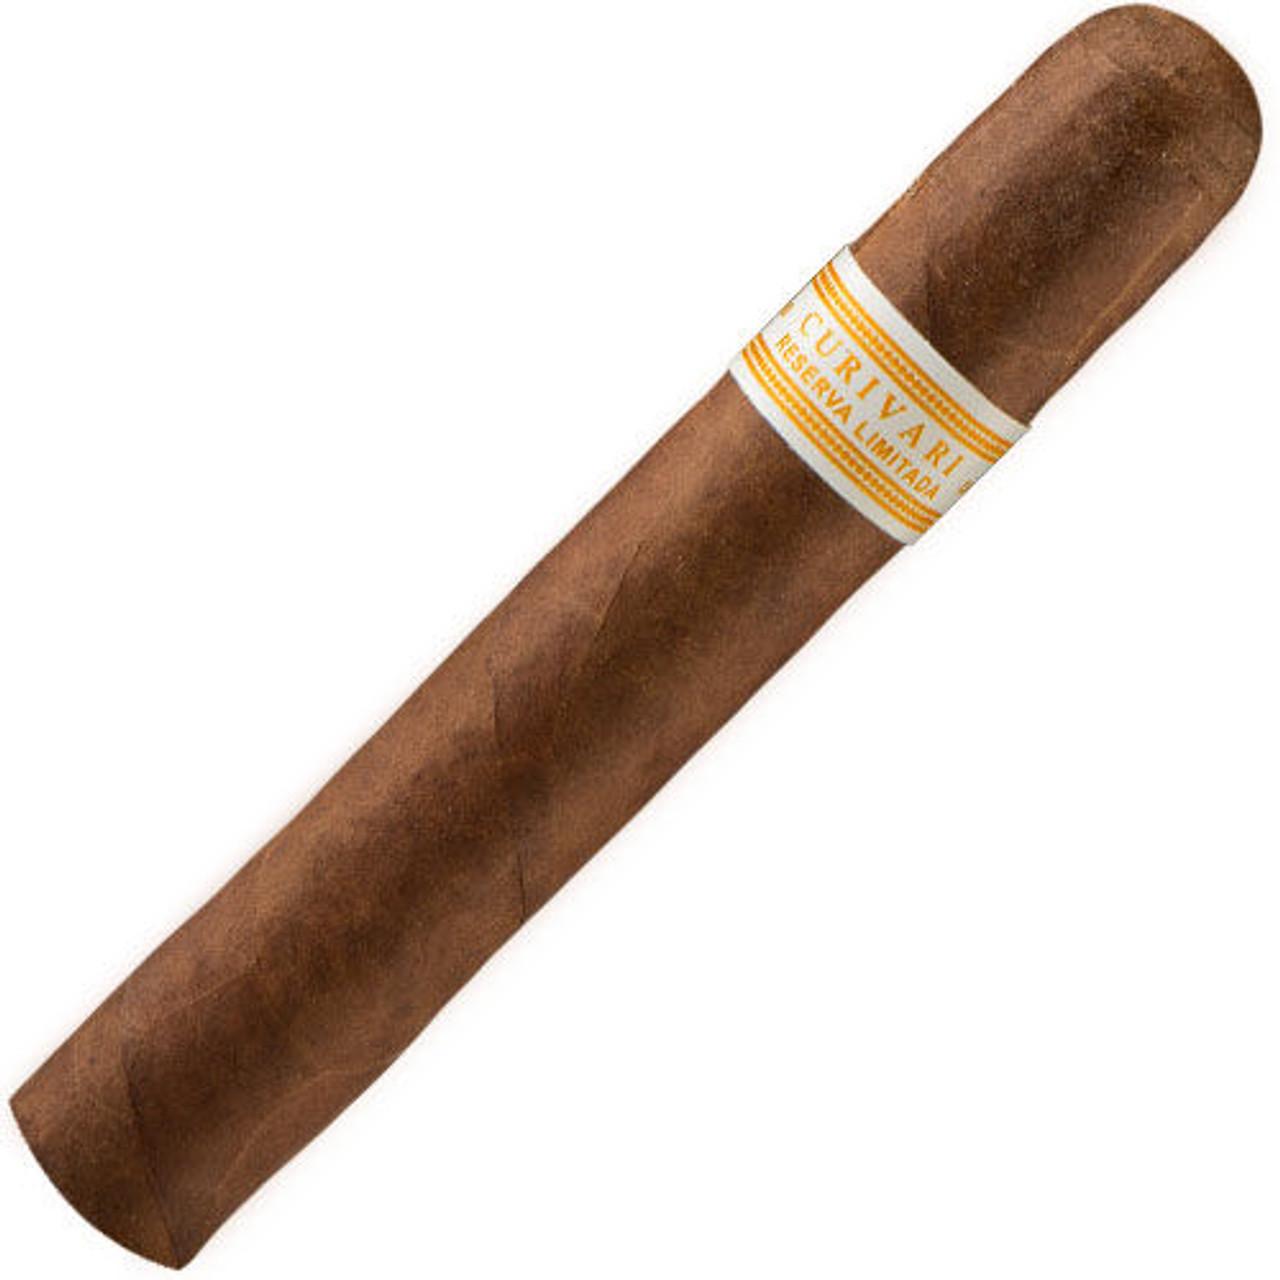 Curivari Reserva Limitada 1000 Series Reserva 3000 Cigars - 6.0 x 50 (Box of 10)